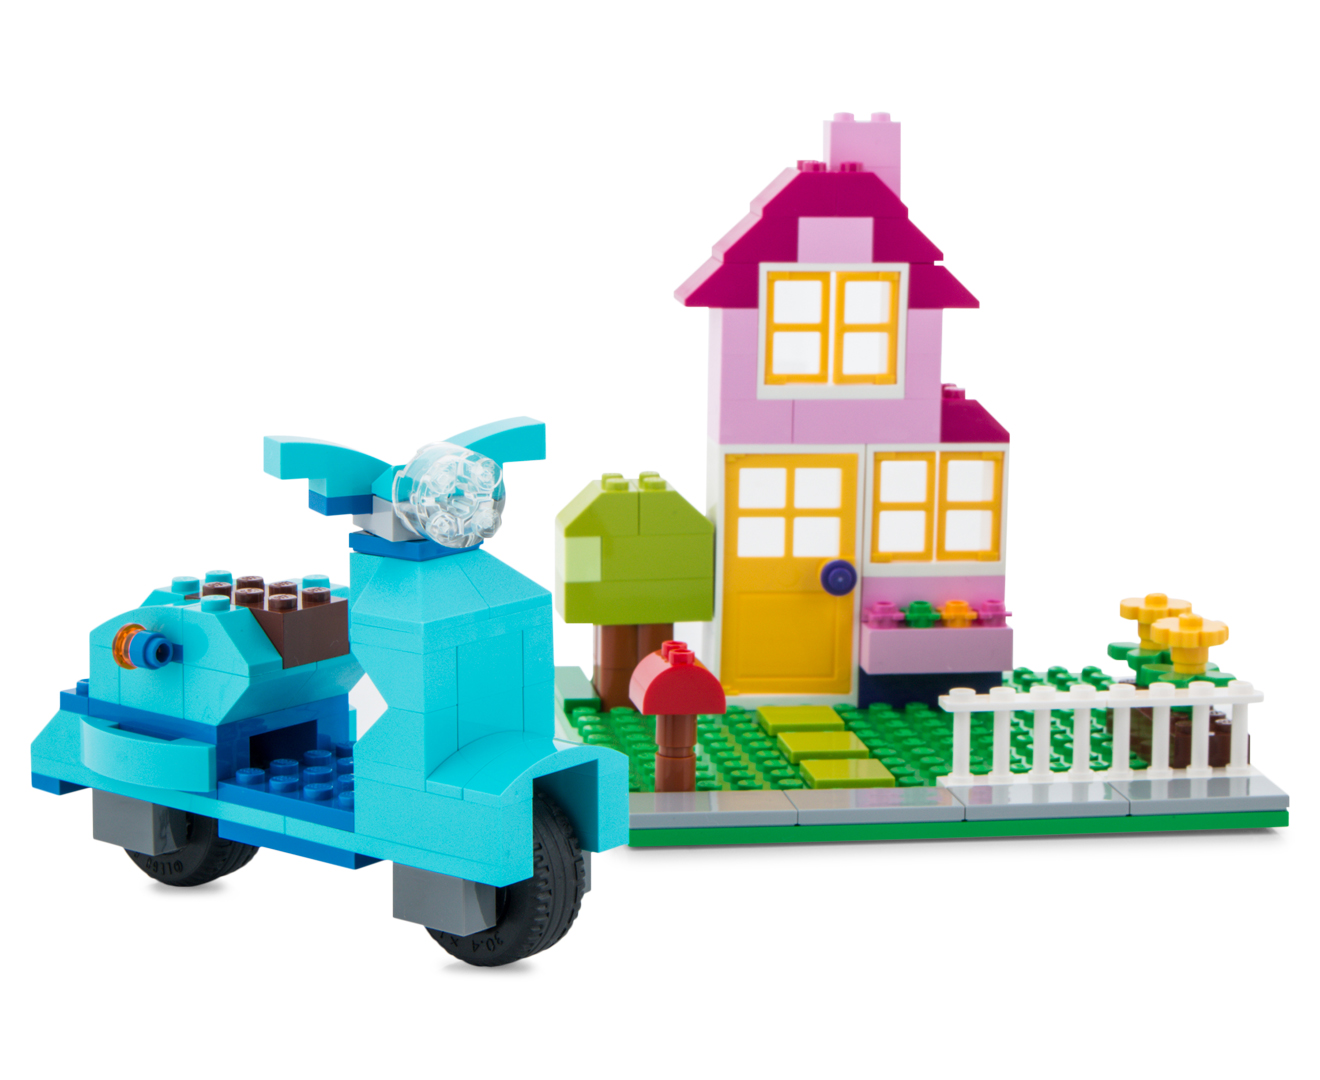 Lego classic creative building box large ebay for Creative lego ideas